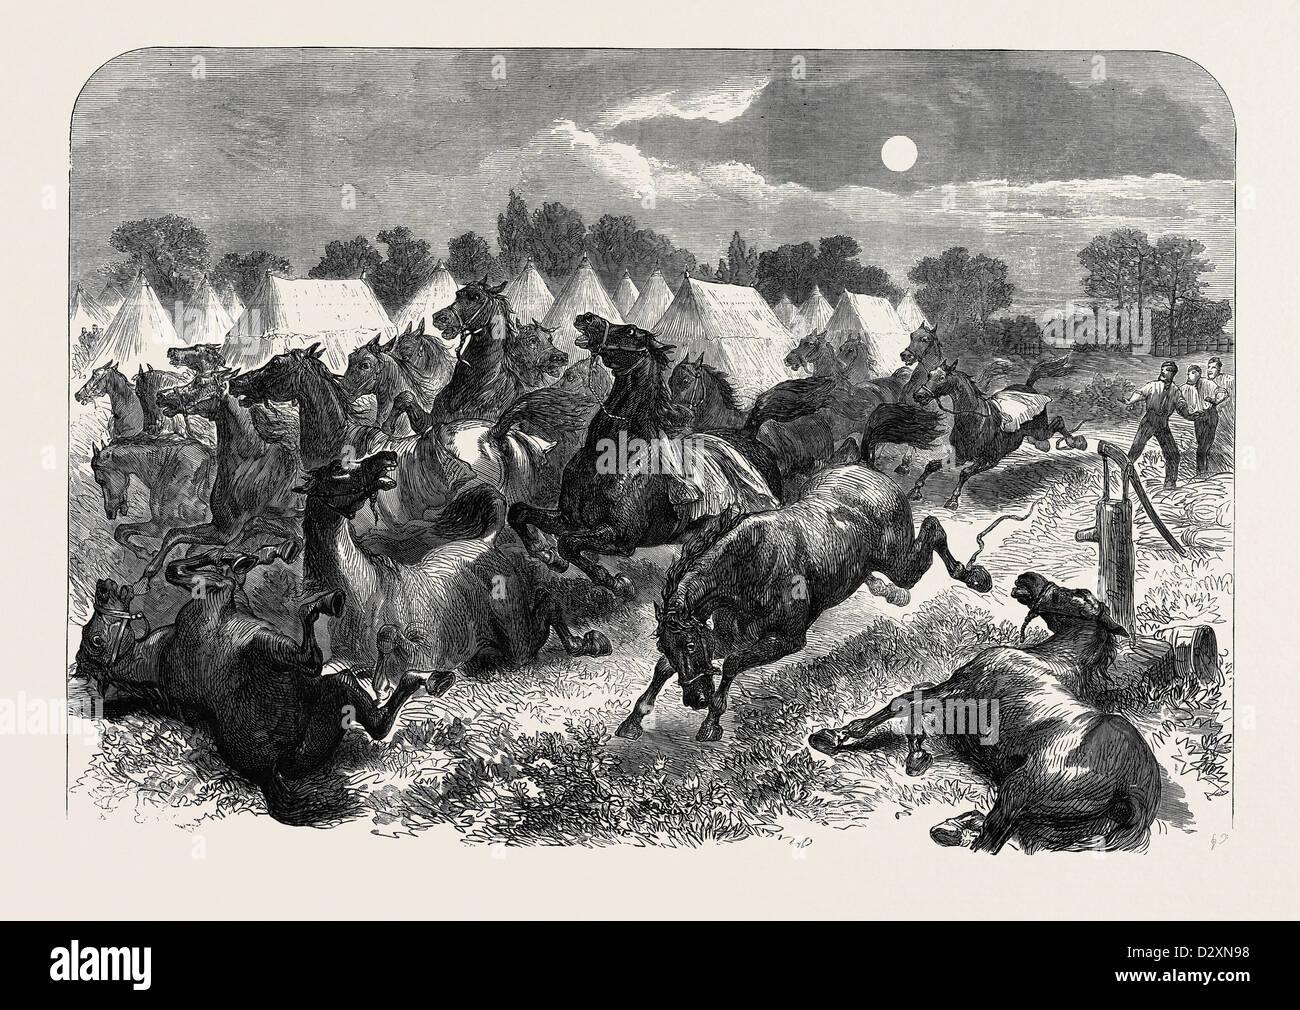 STAMPEDE OF CAVALRY HORSES AT ALDERSHOTT CAMP 1871 - Stock Image